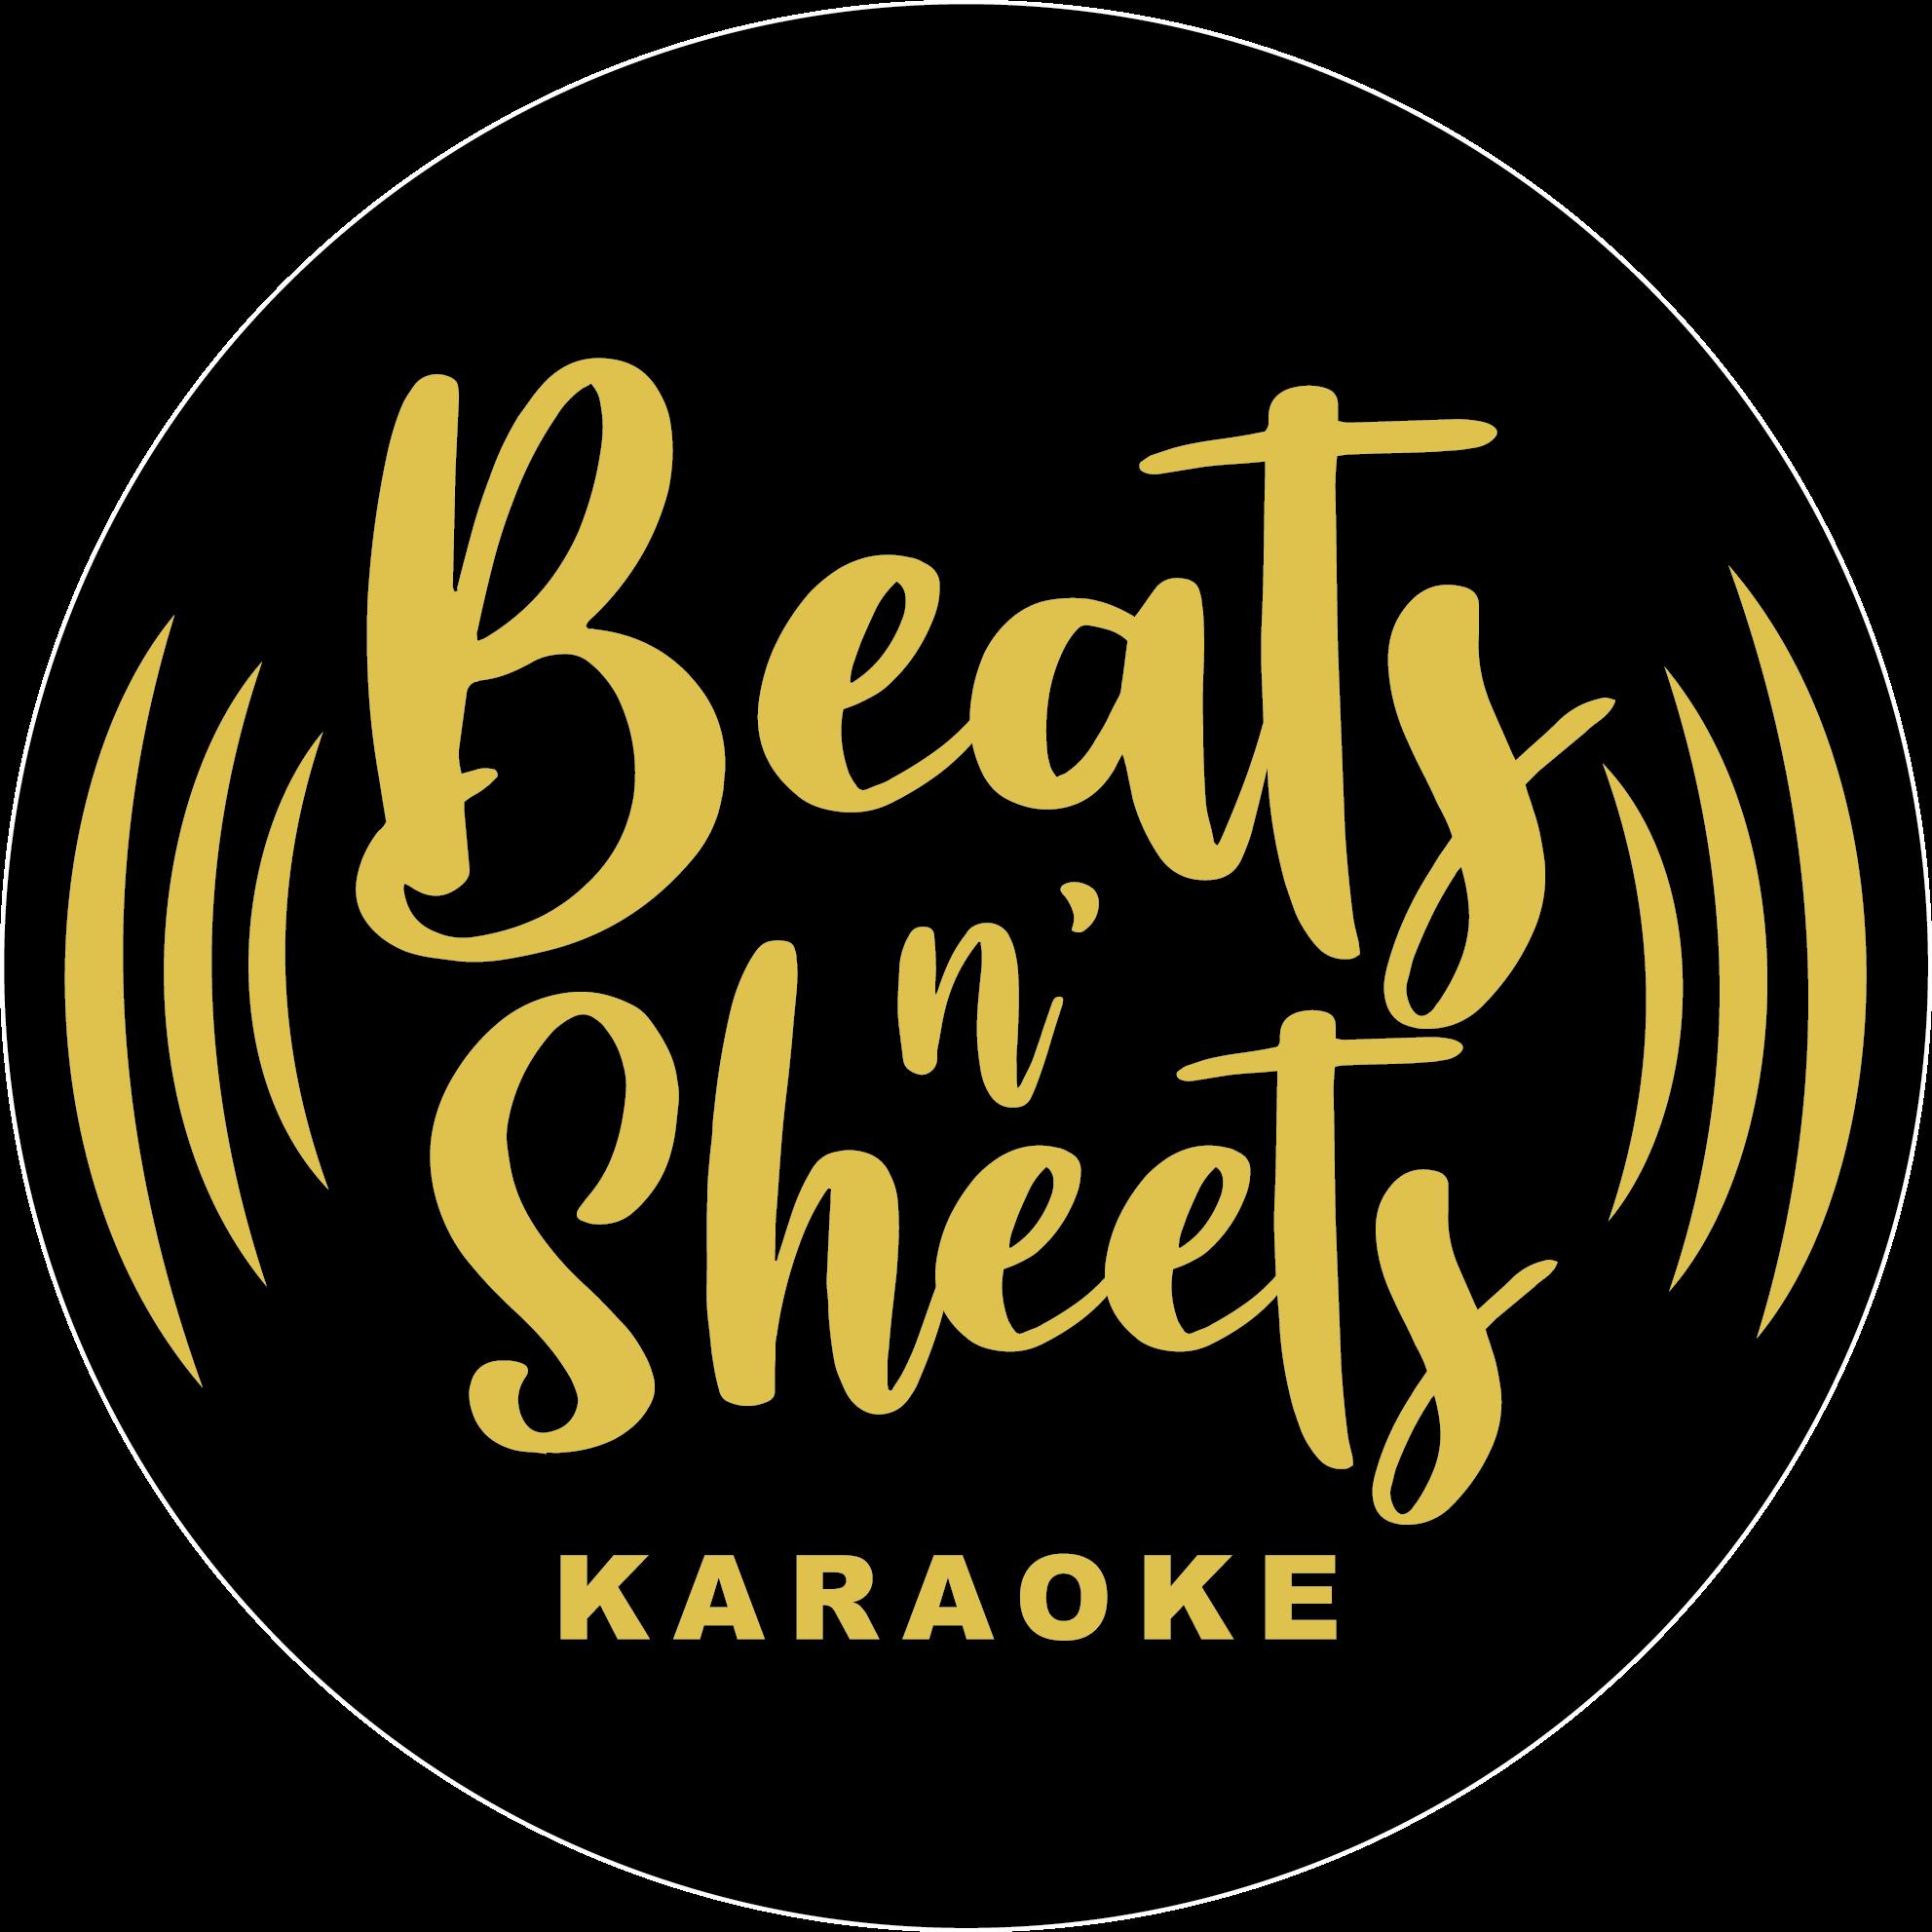 beatsandsheets-official-logo